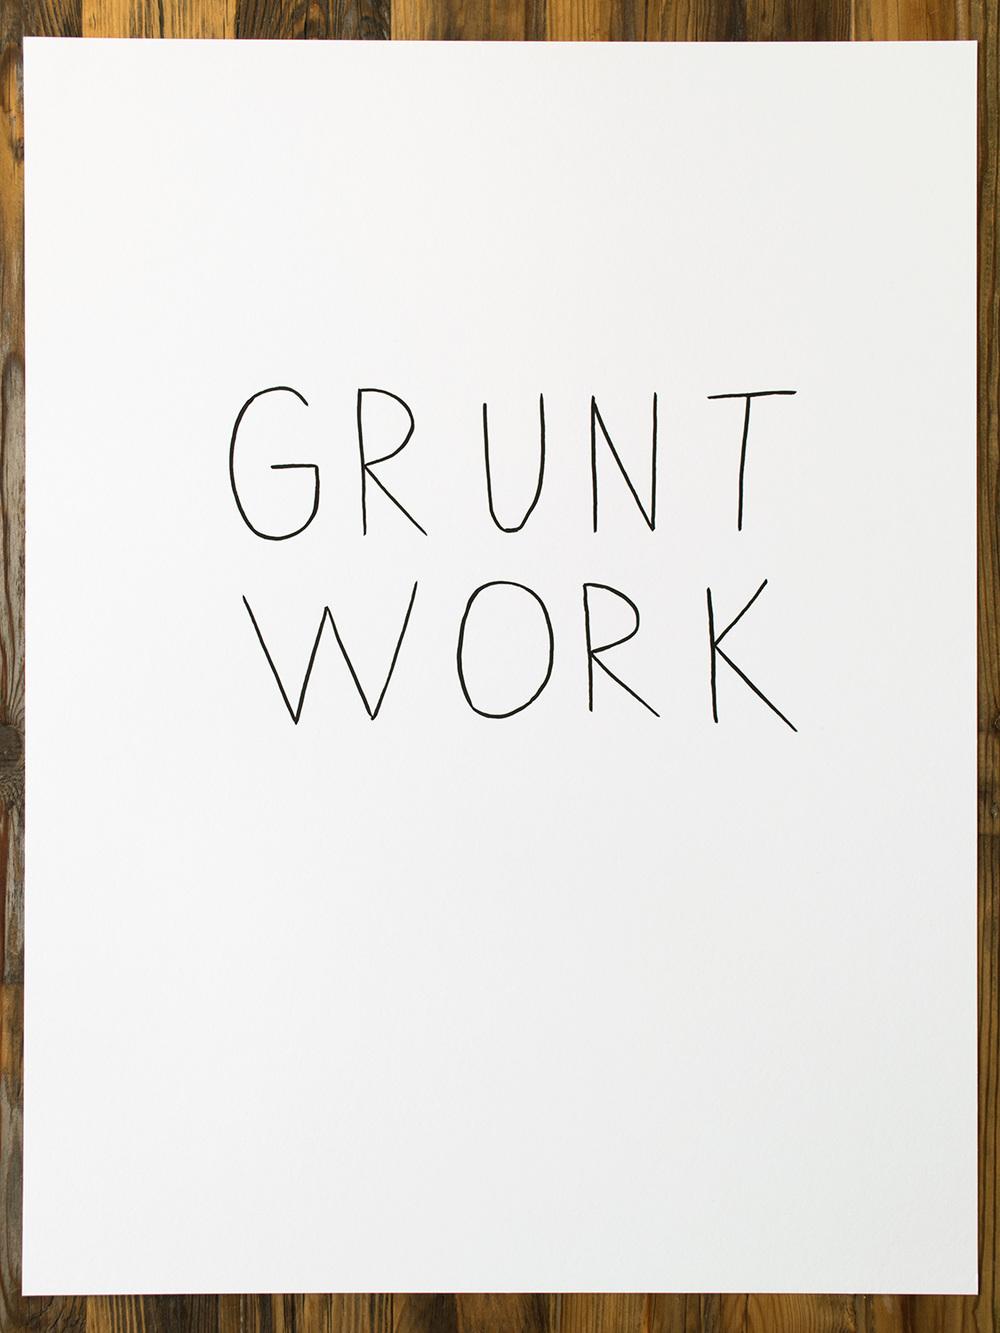 grunt_work-1500x1125.jpg